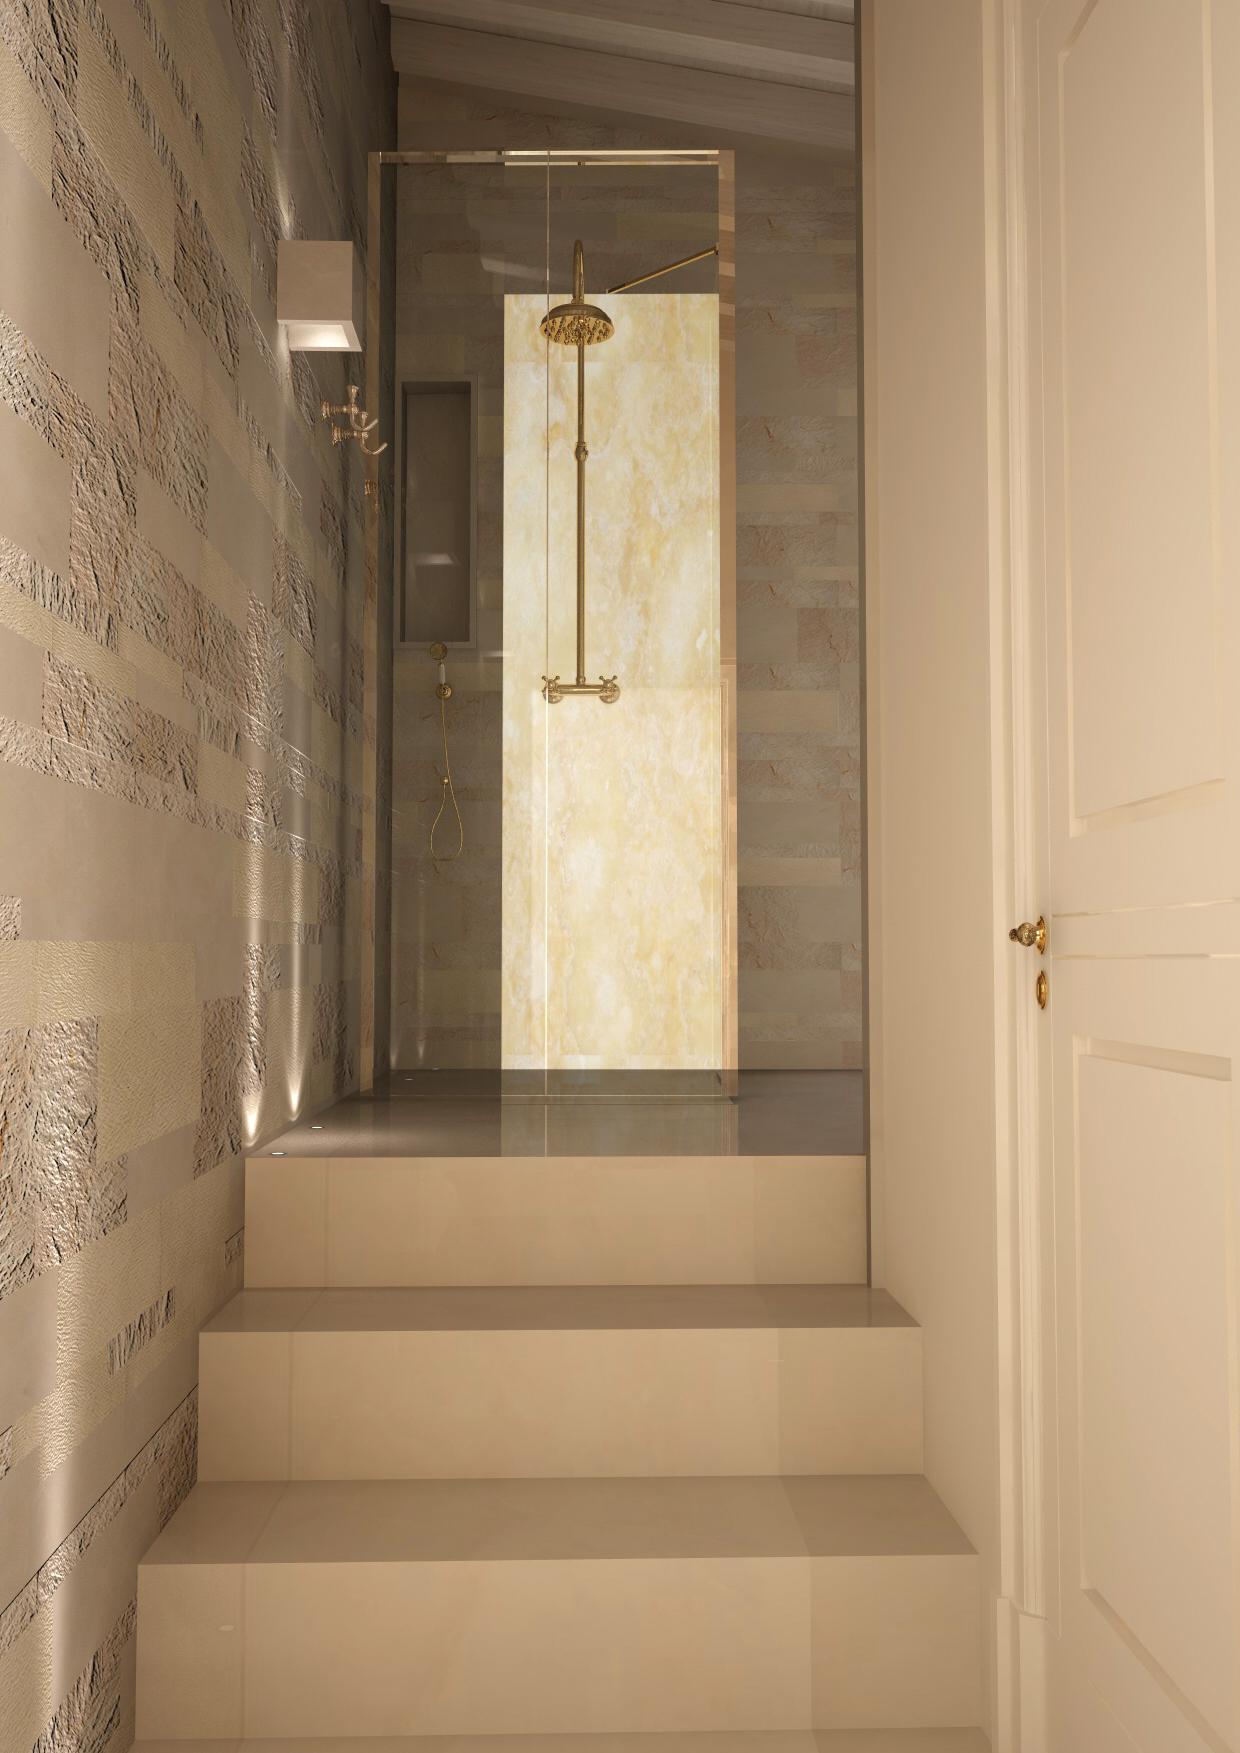 ingresso area welness bagno padronale